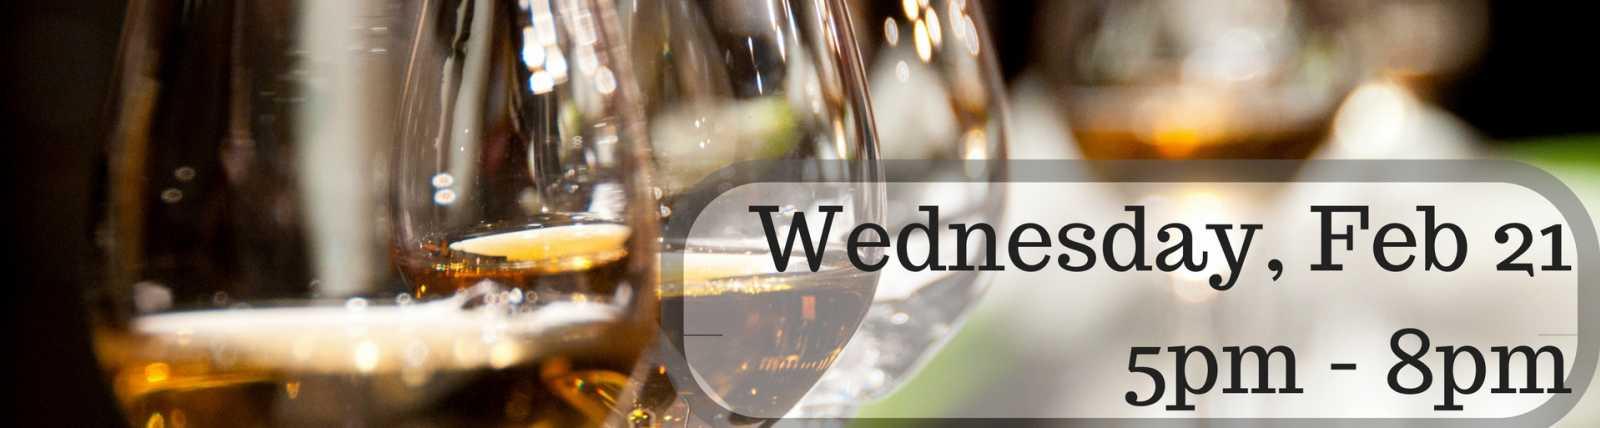 Waterland Wine & Art Walk